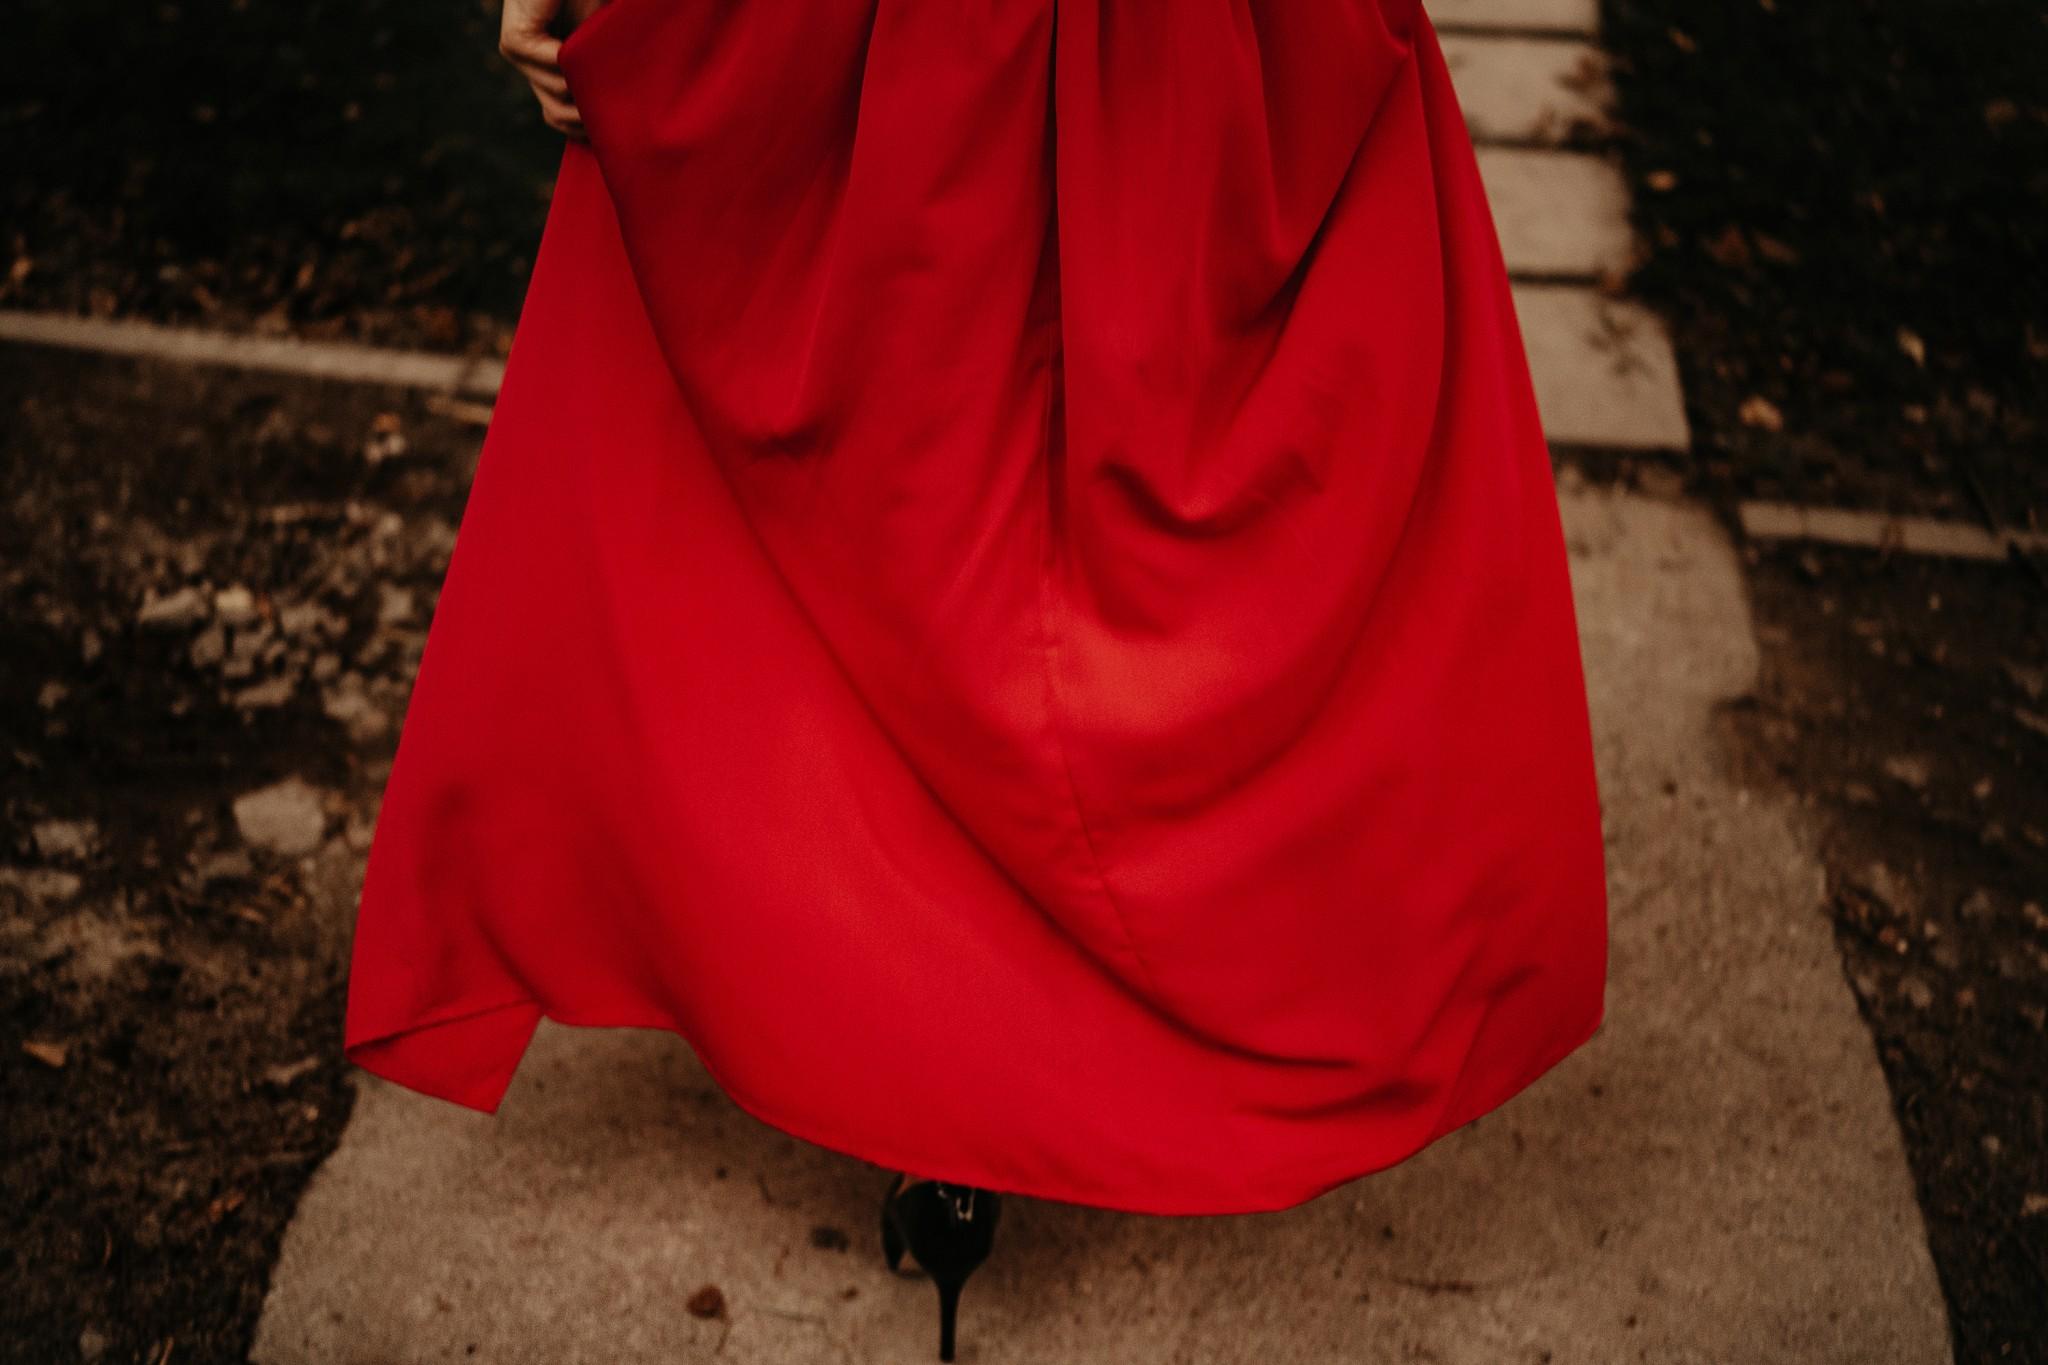 fotograf poznan wesele dobra truskawka piekne wesele pod poznaniem wesele w dobrej truskawce piekna para mloda slub marzen slub koronawirus slub listopad wesele koronawirus 329